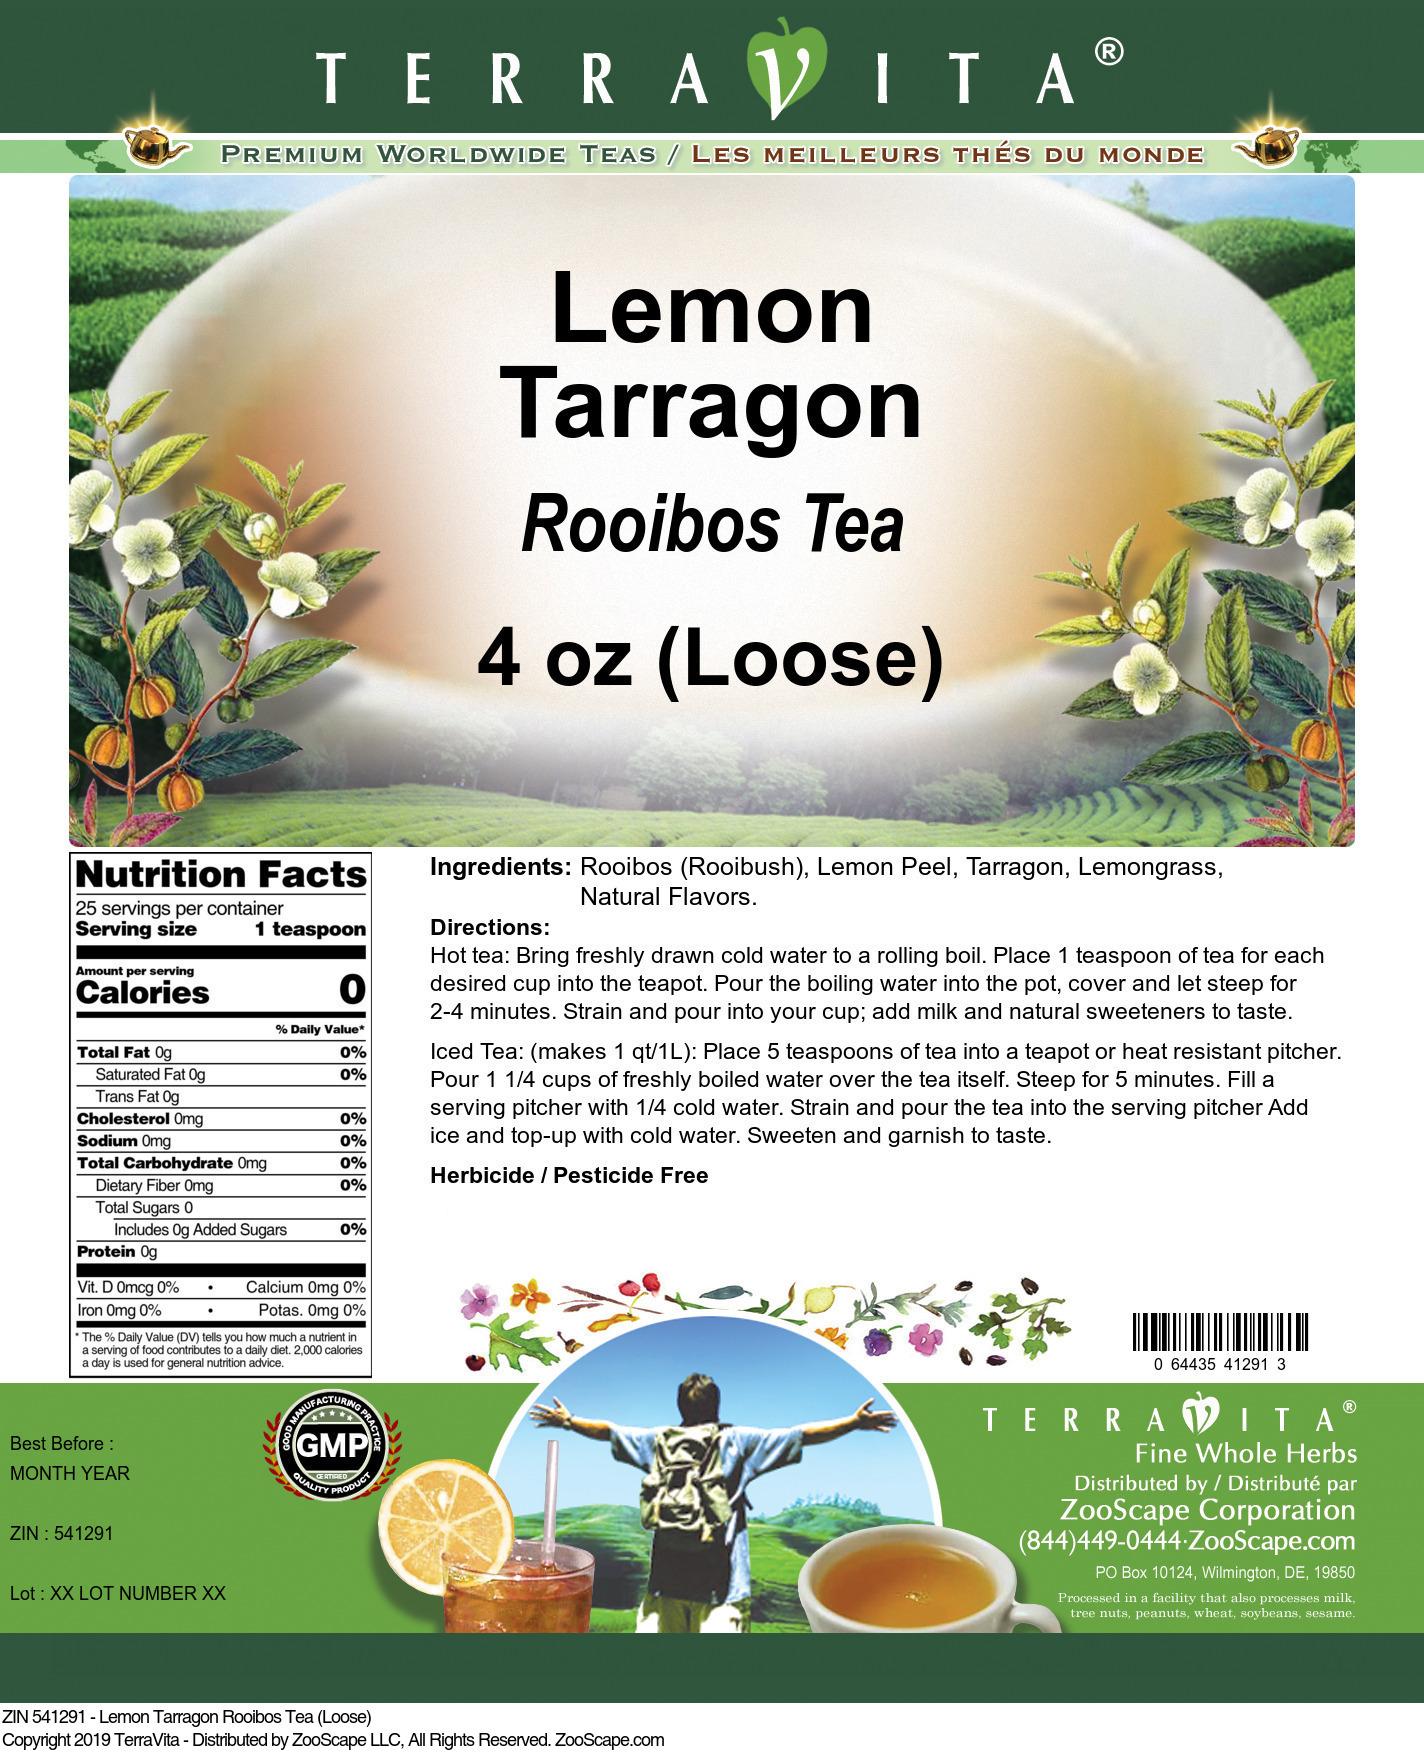 Lemon Tarragon Rooibos Tea